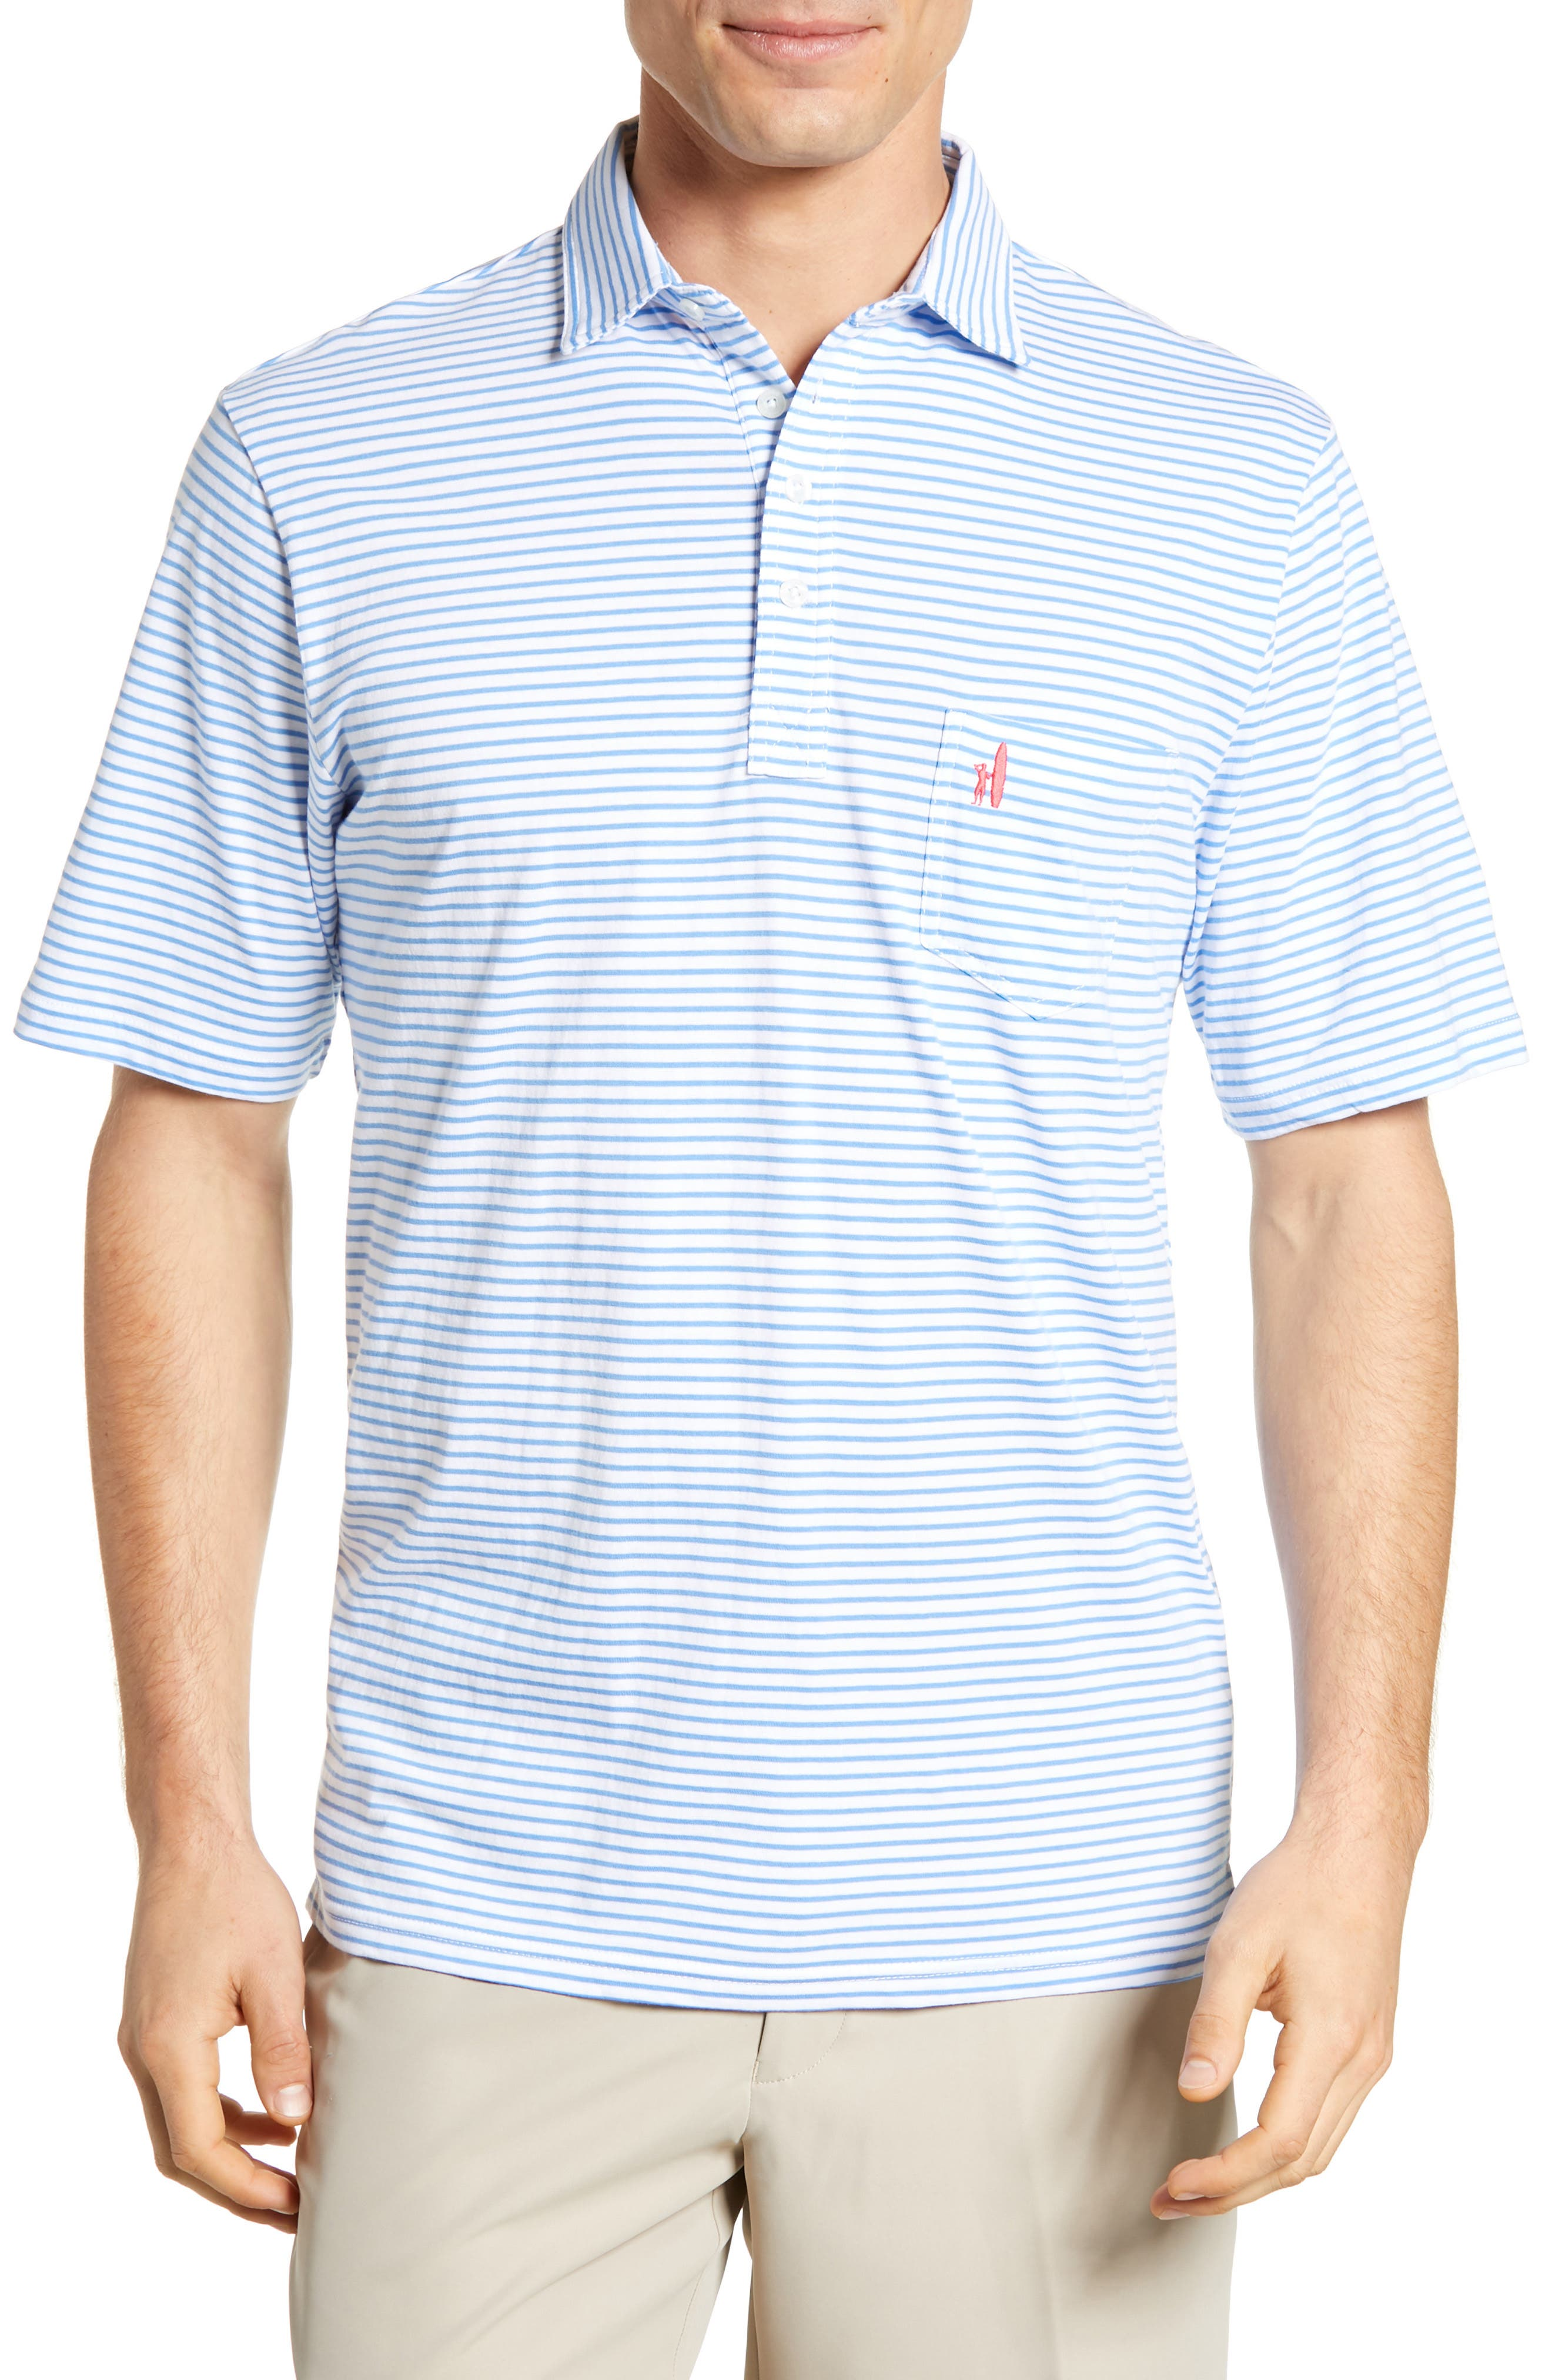 Macon Regular Fit Stripe Polo,                             Main thumbnail 1, color,                             WHITE